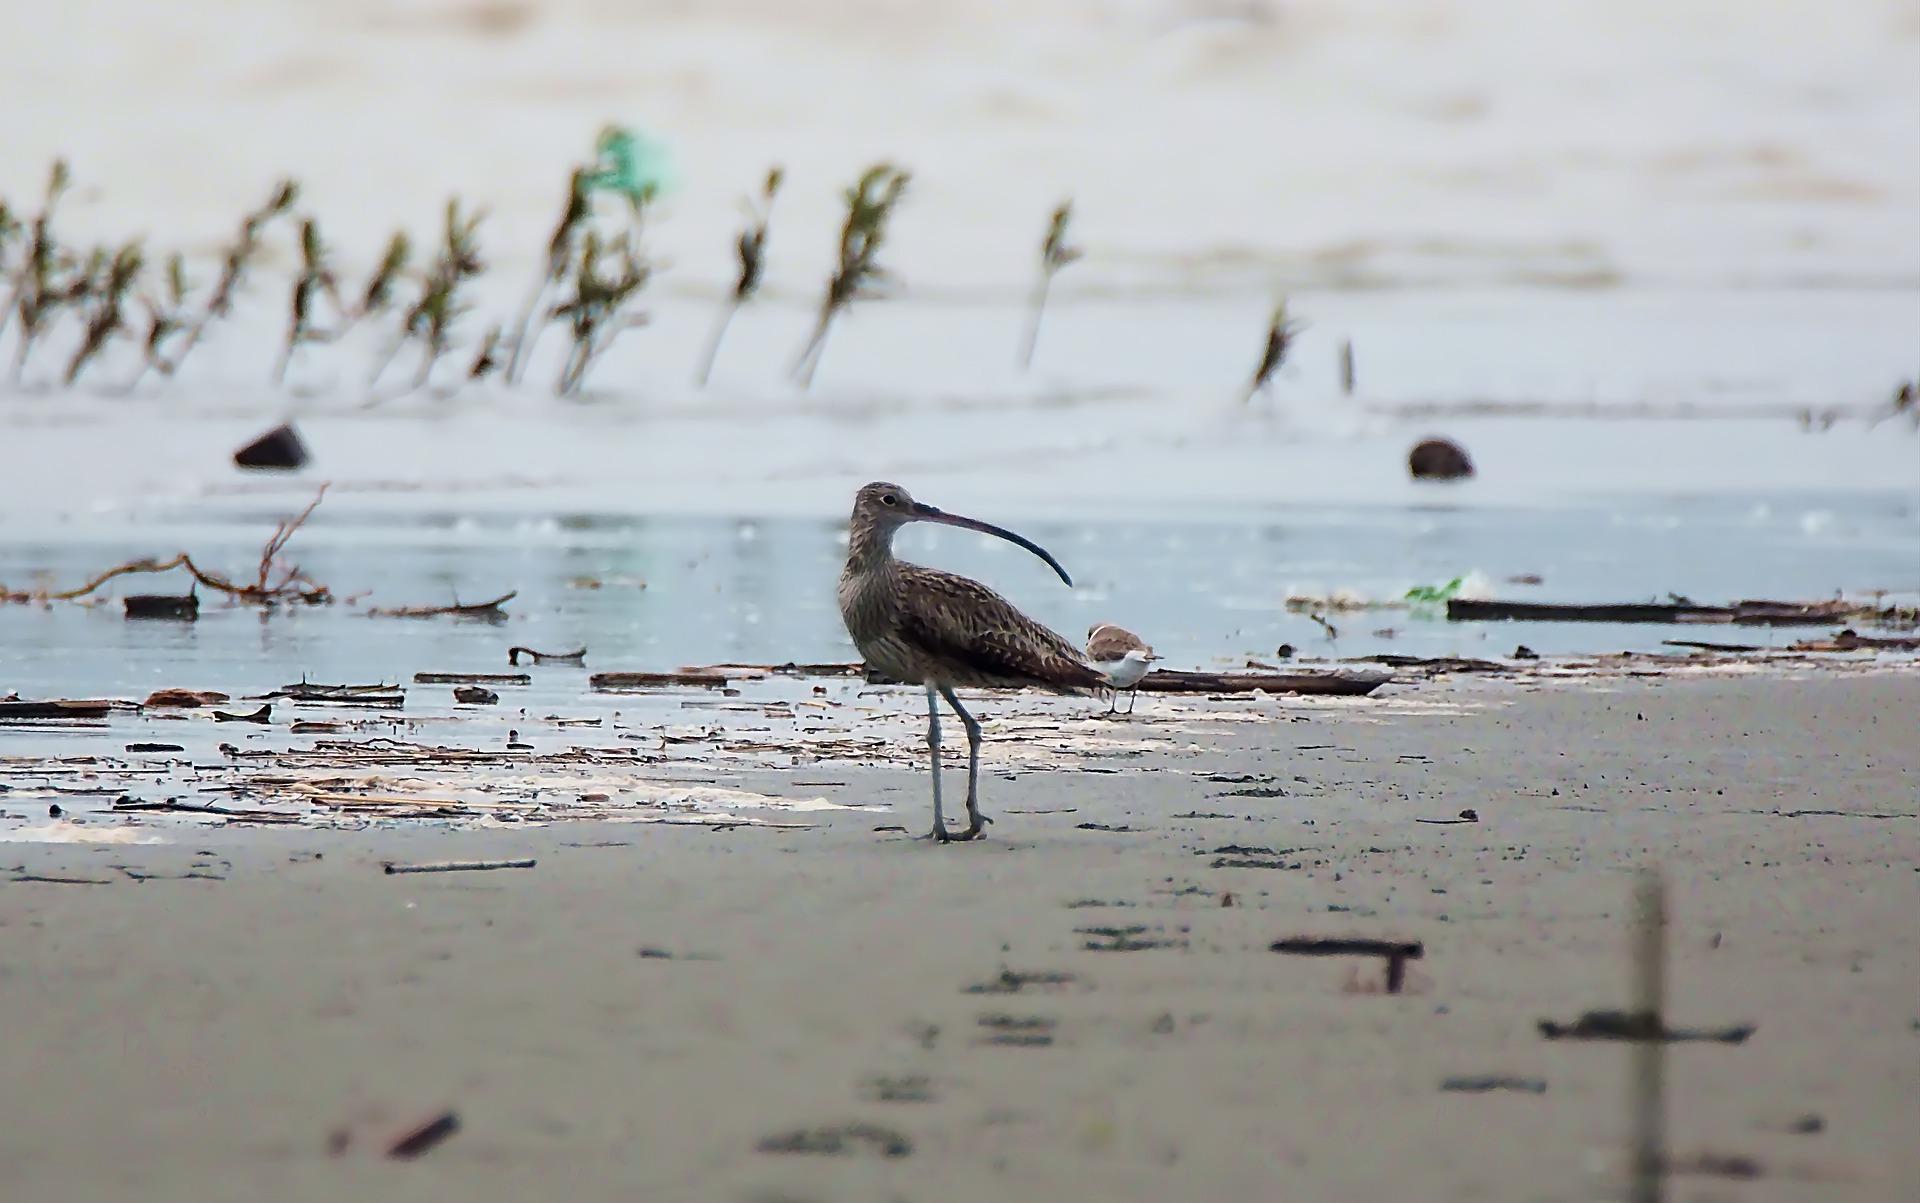 Großer Brachvogel am Wasser